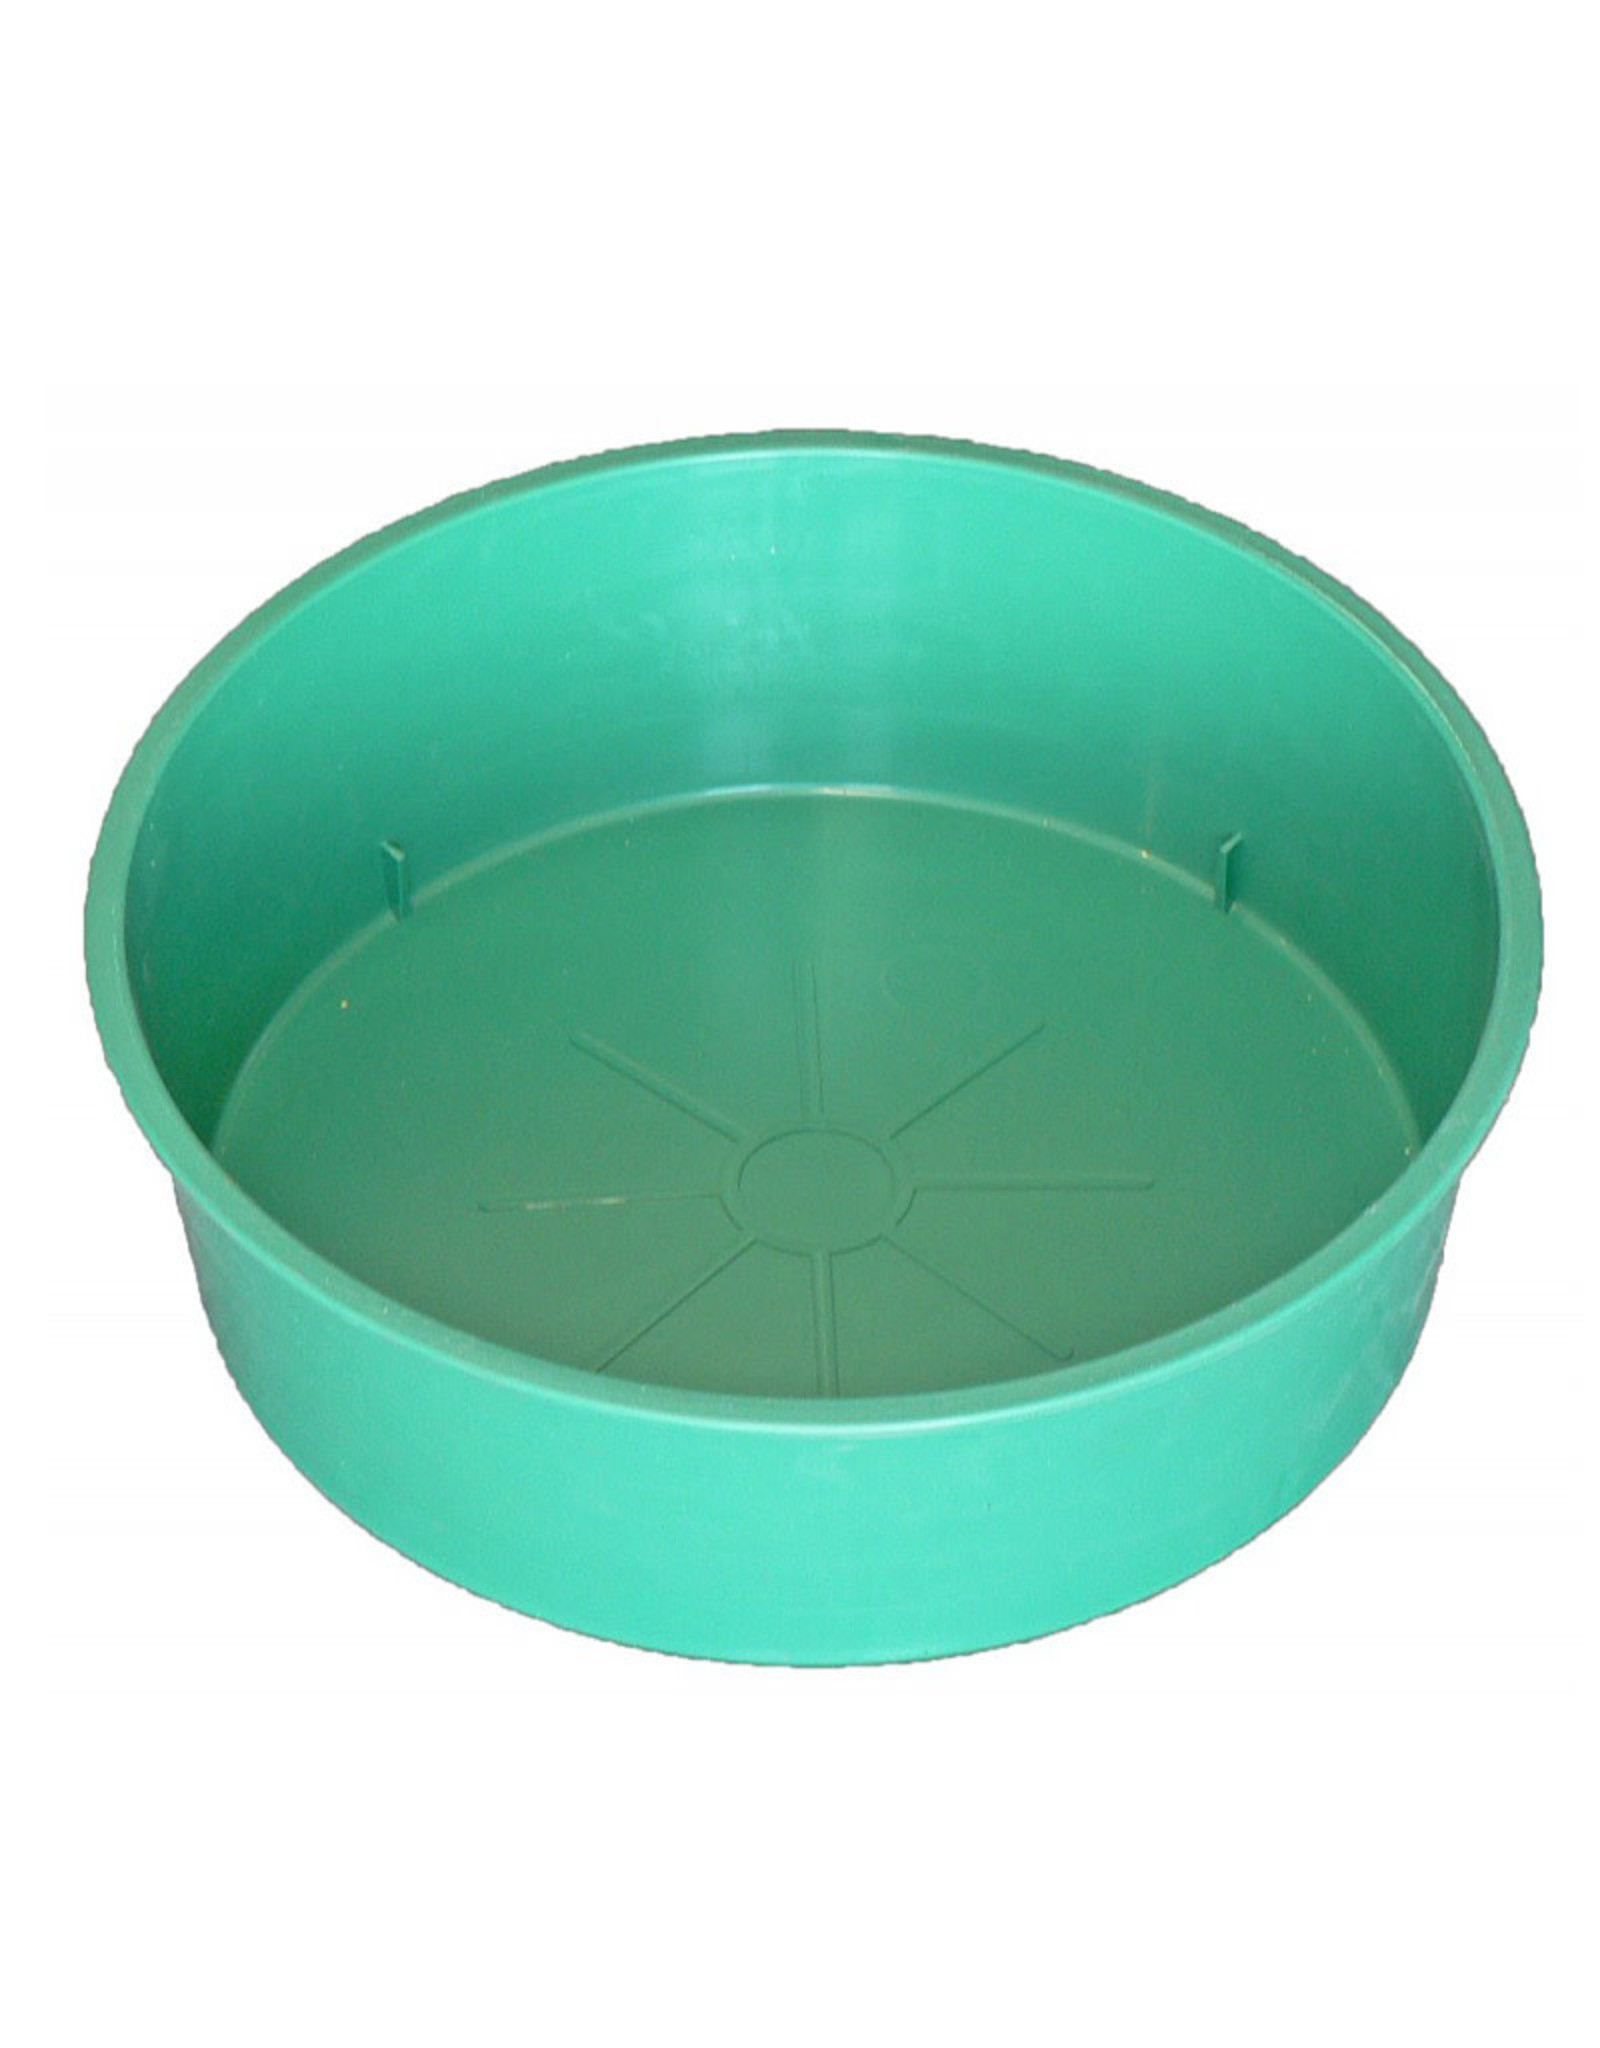 Christmas Tree Water Bowl 2.5 Gallon